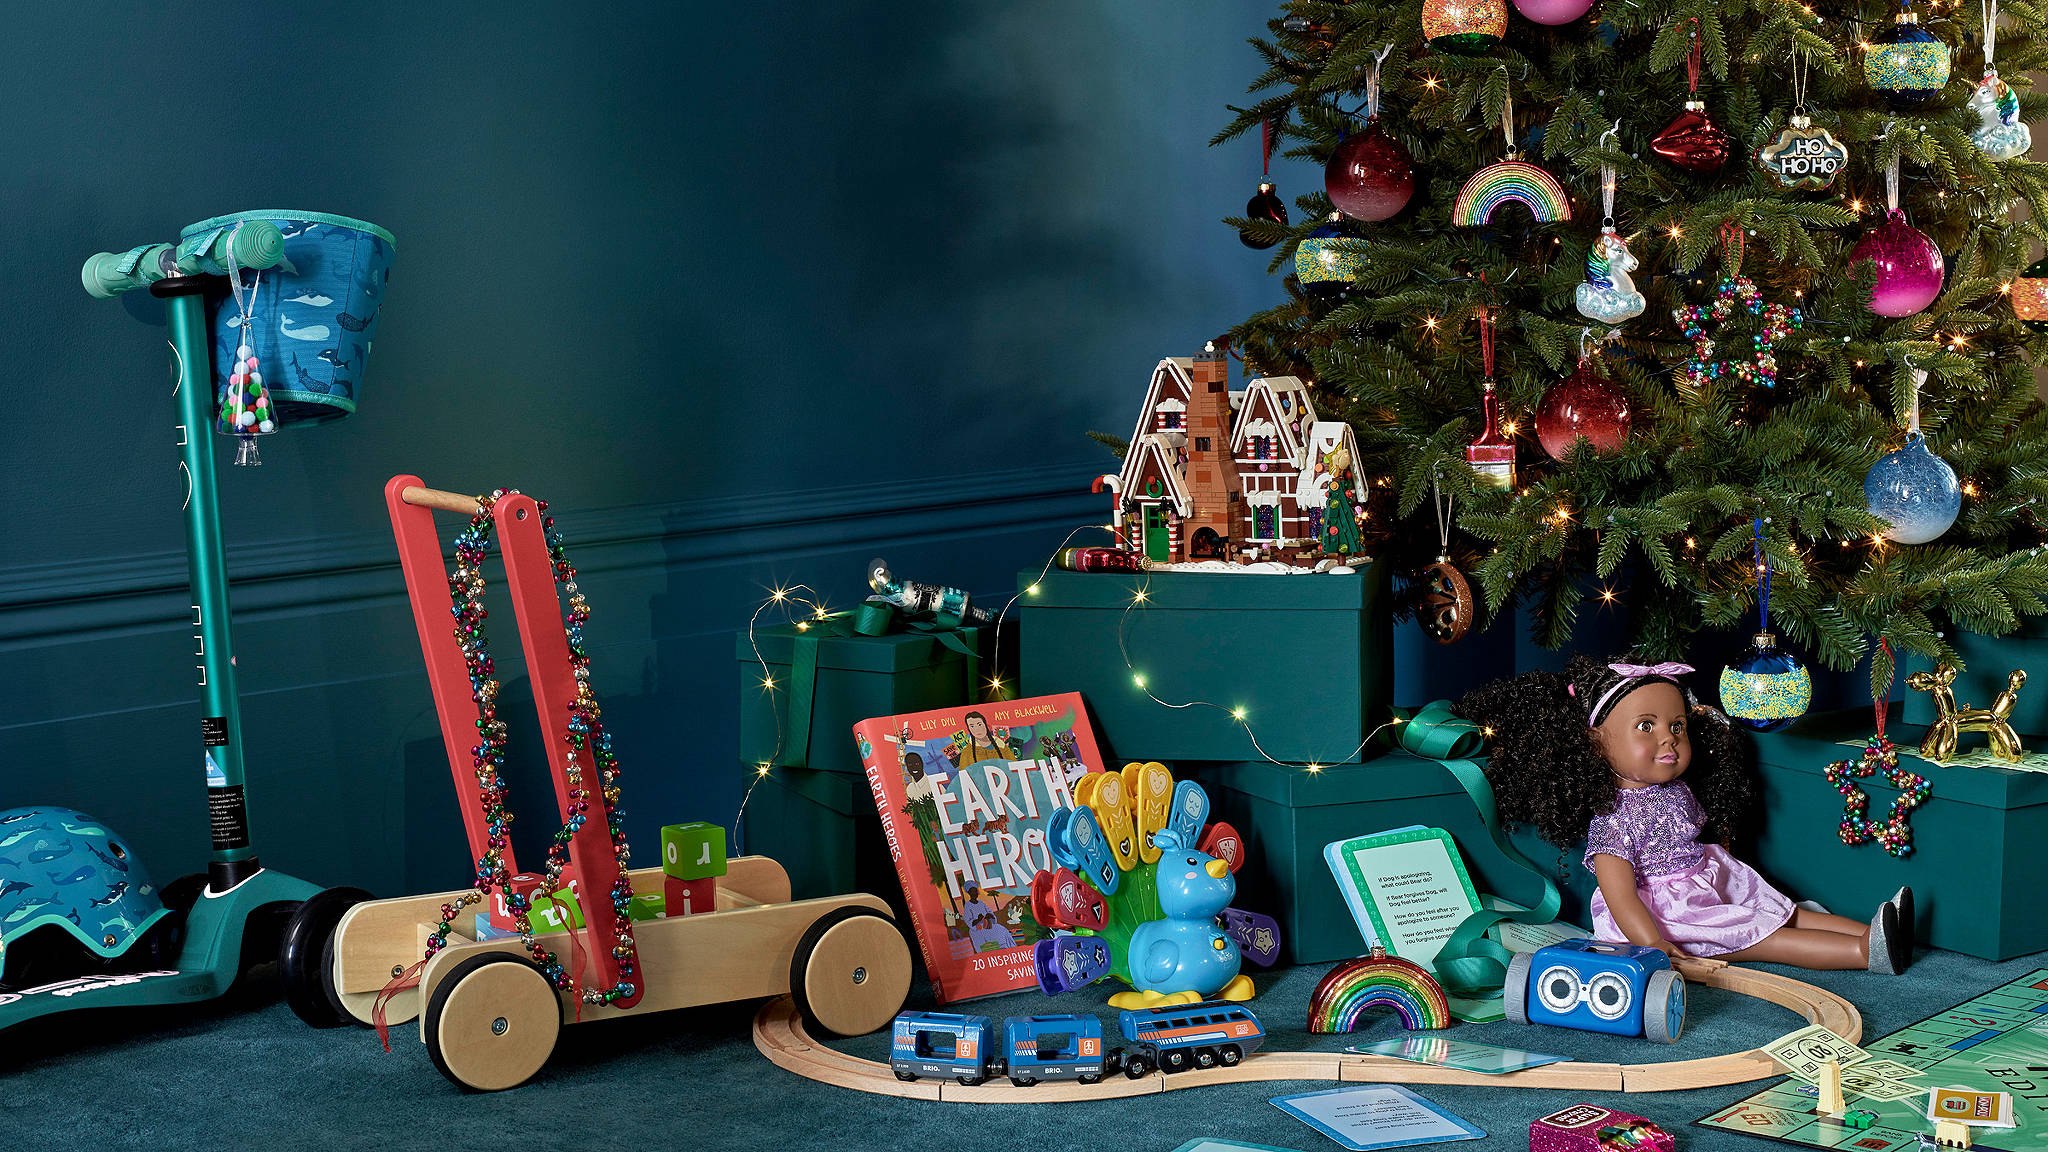 10 best toys for Christmas 2020 | John Lewis & Partners